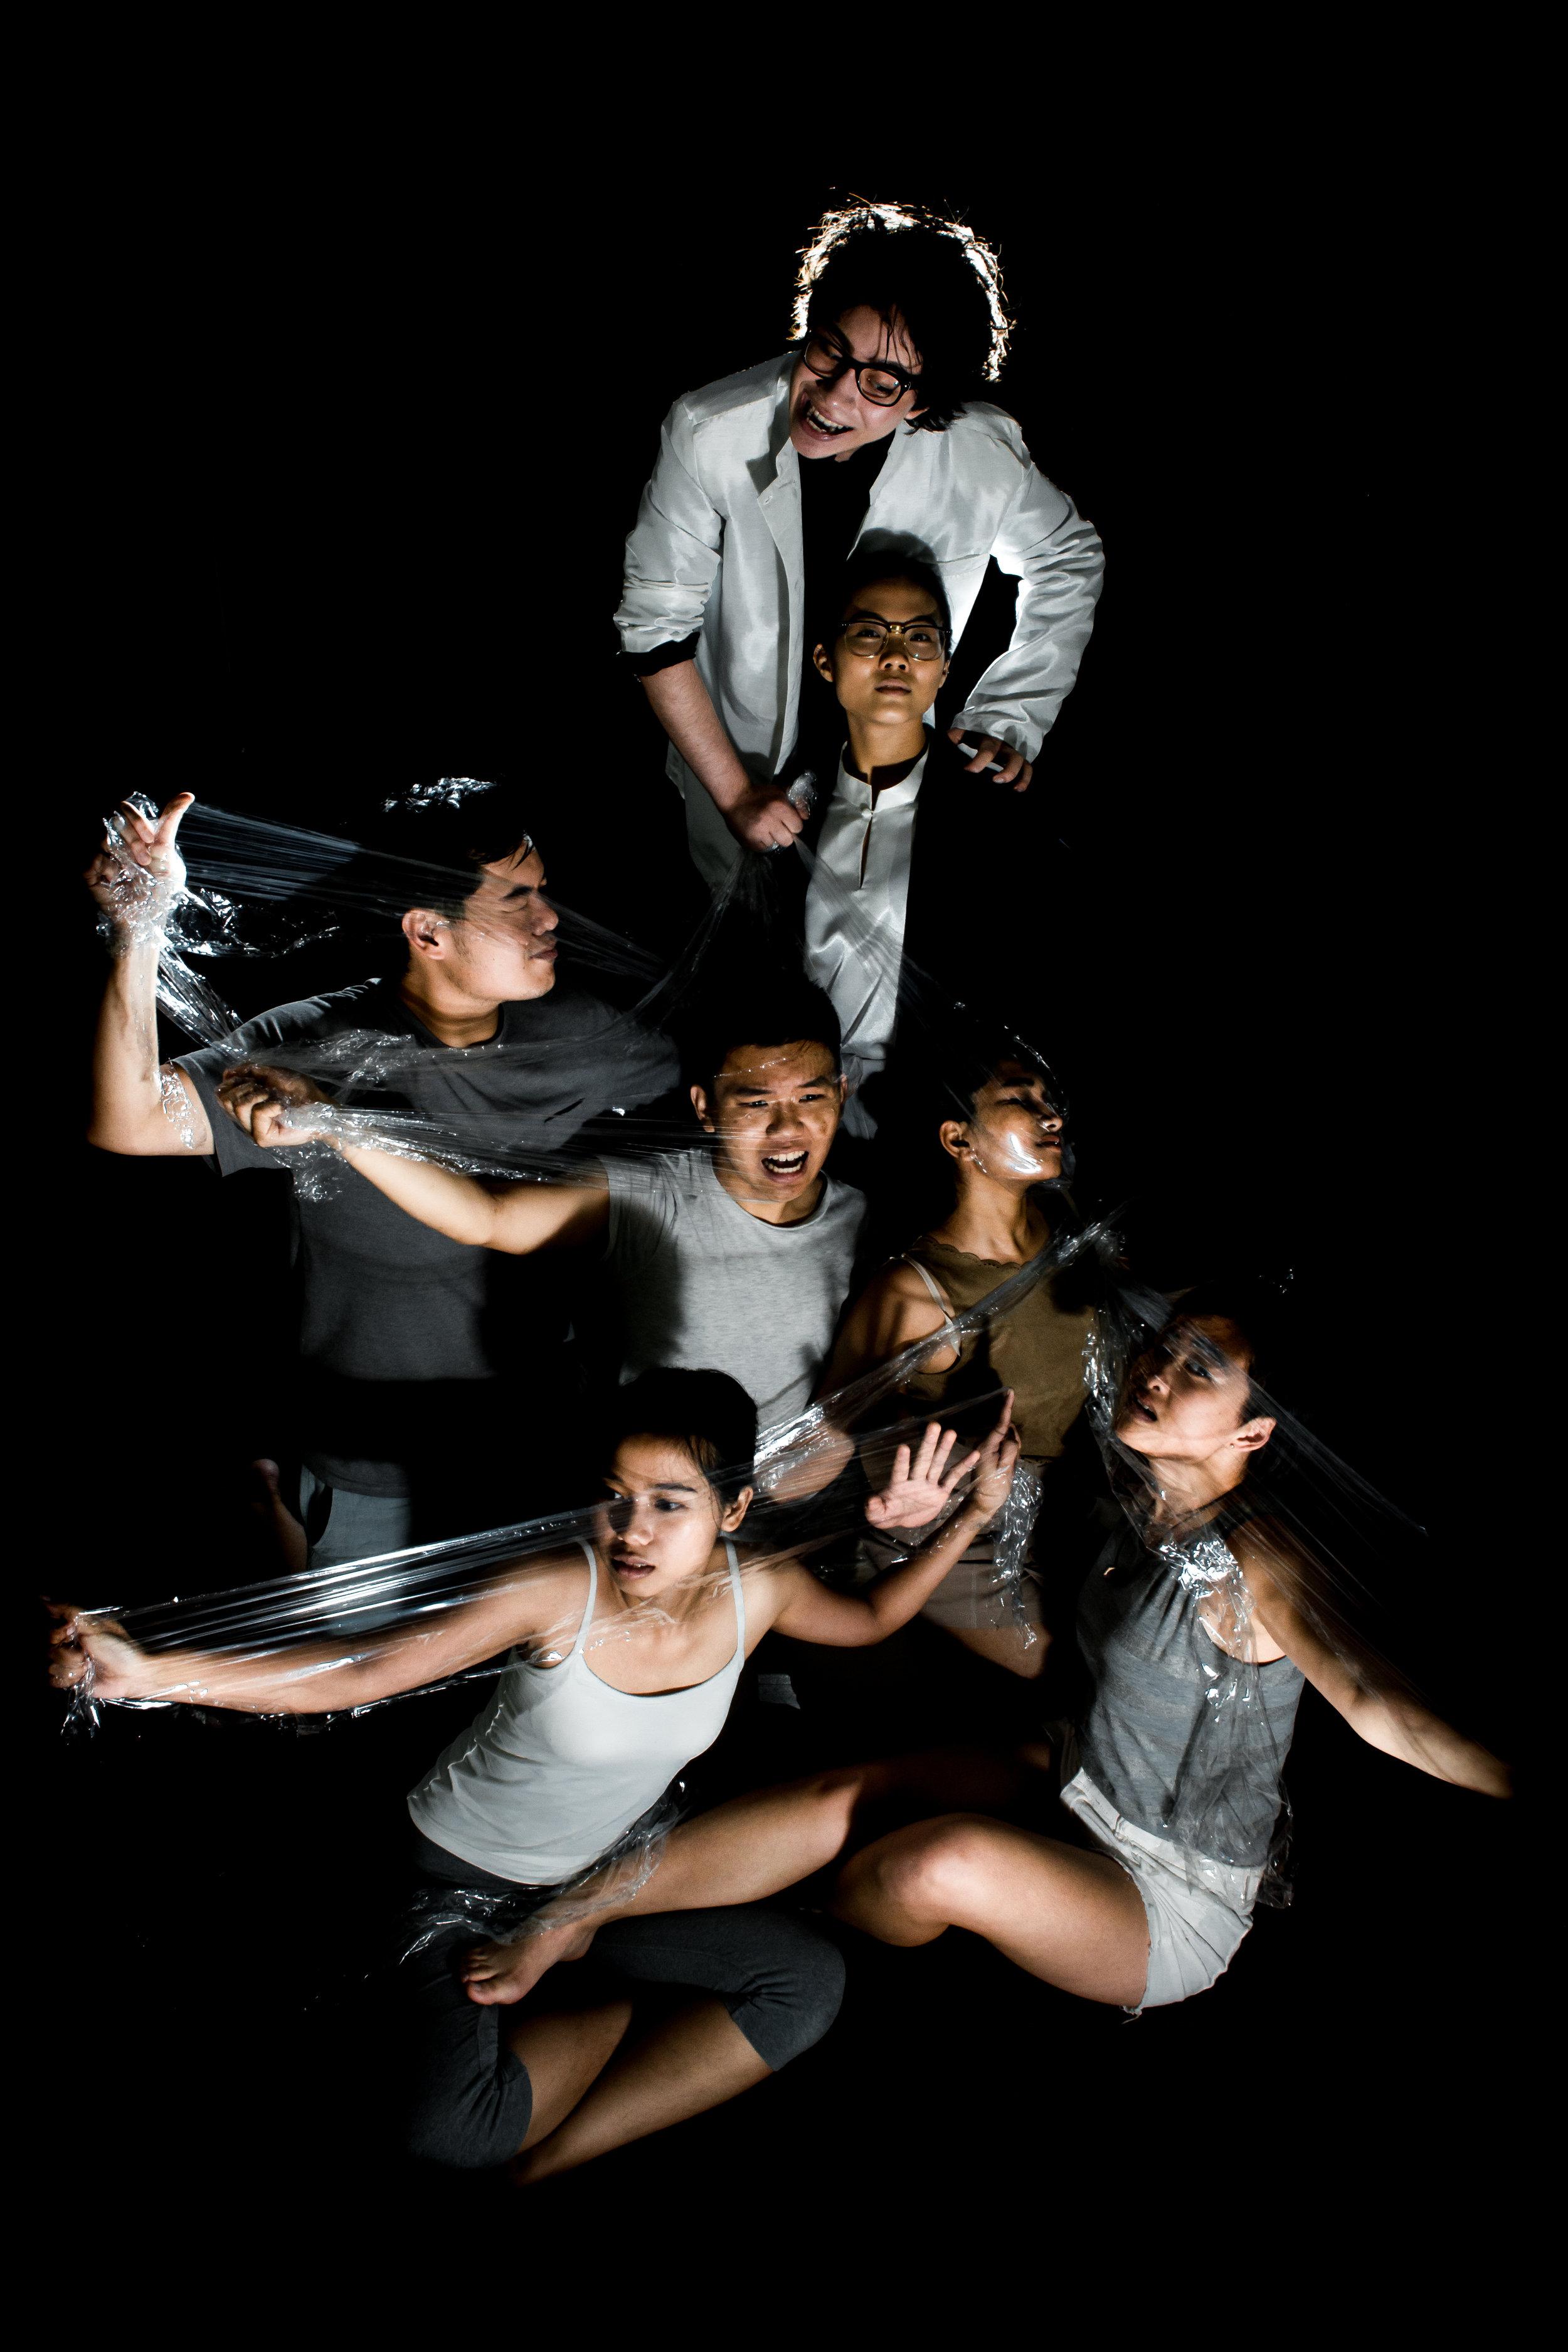 Fix the Musical 0 - Poster (TET Photography).jpg